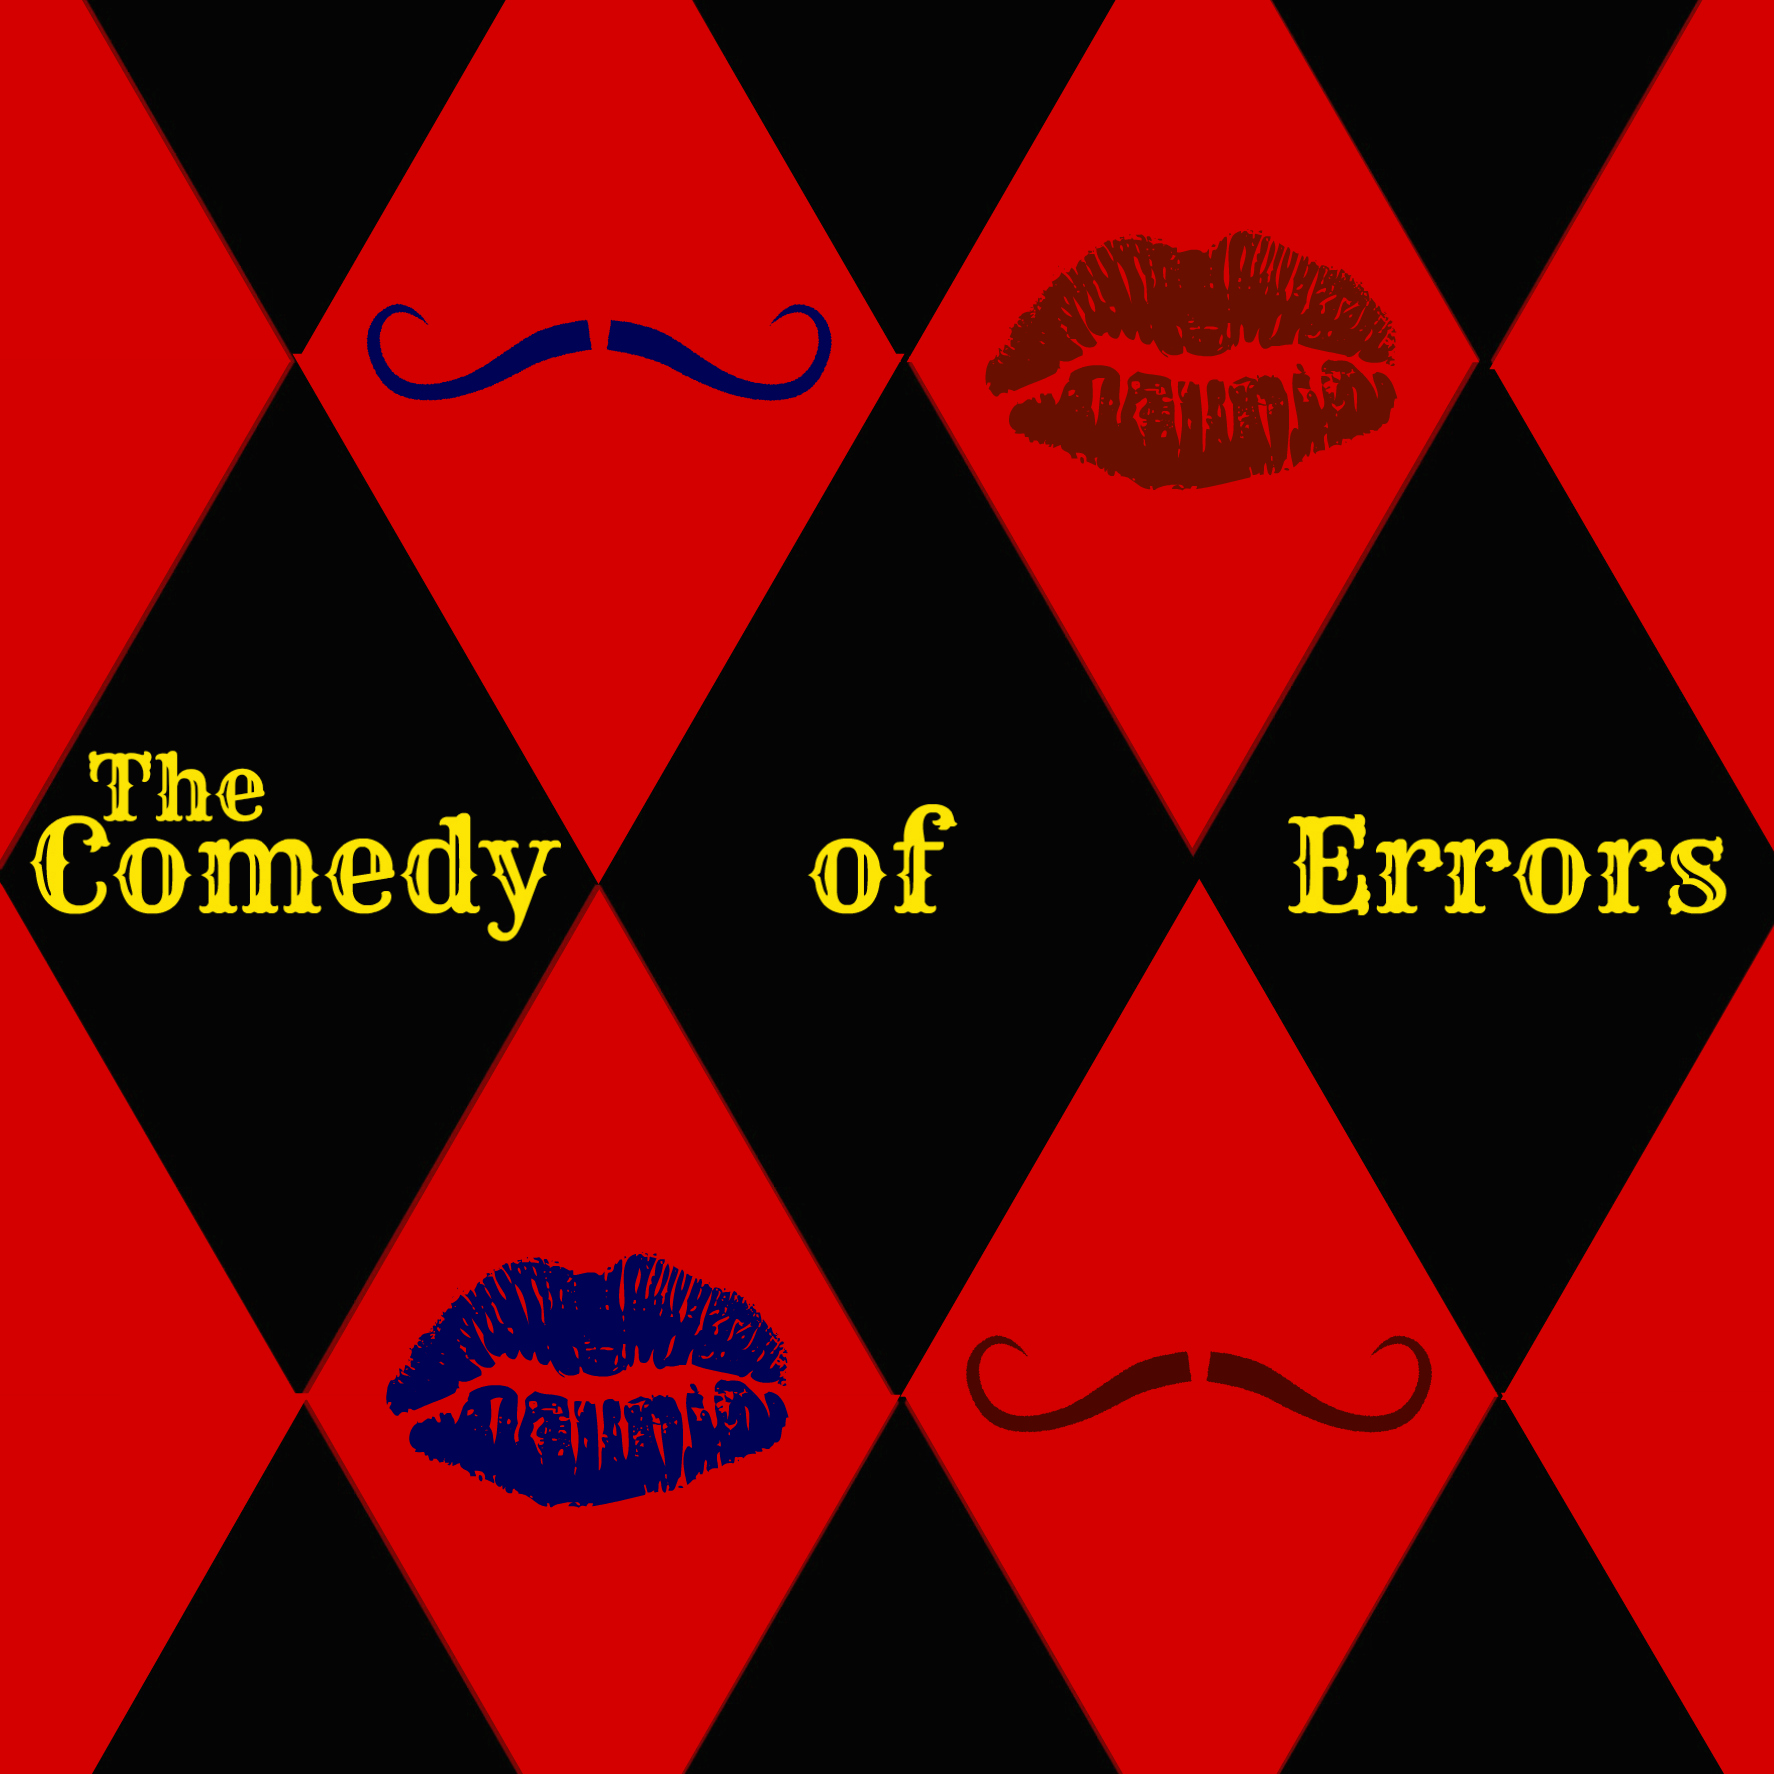 Comedy of errors final.jpg